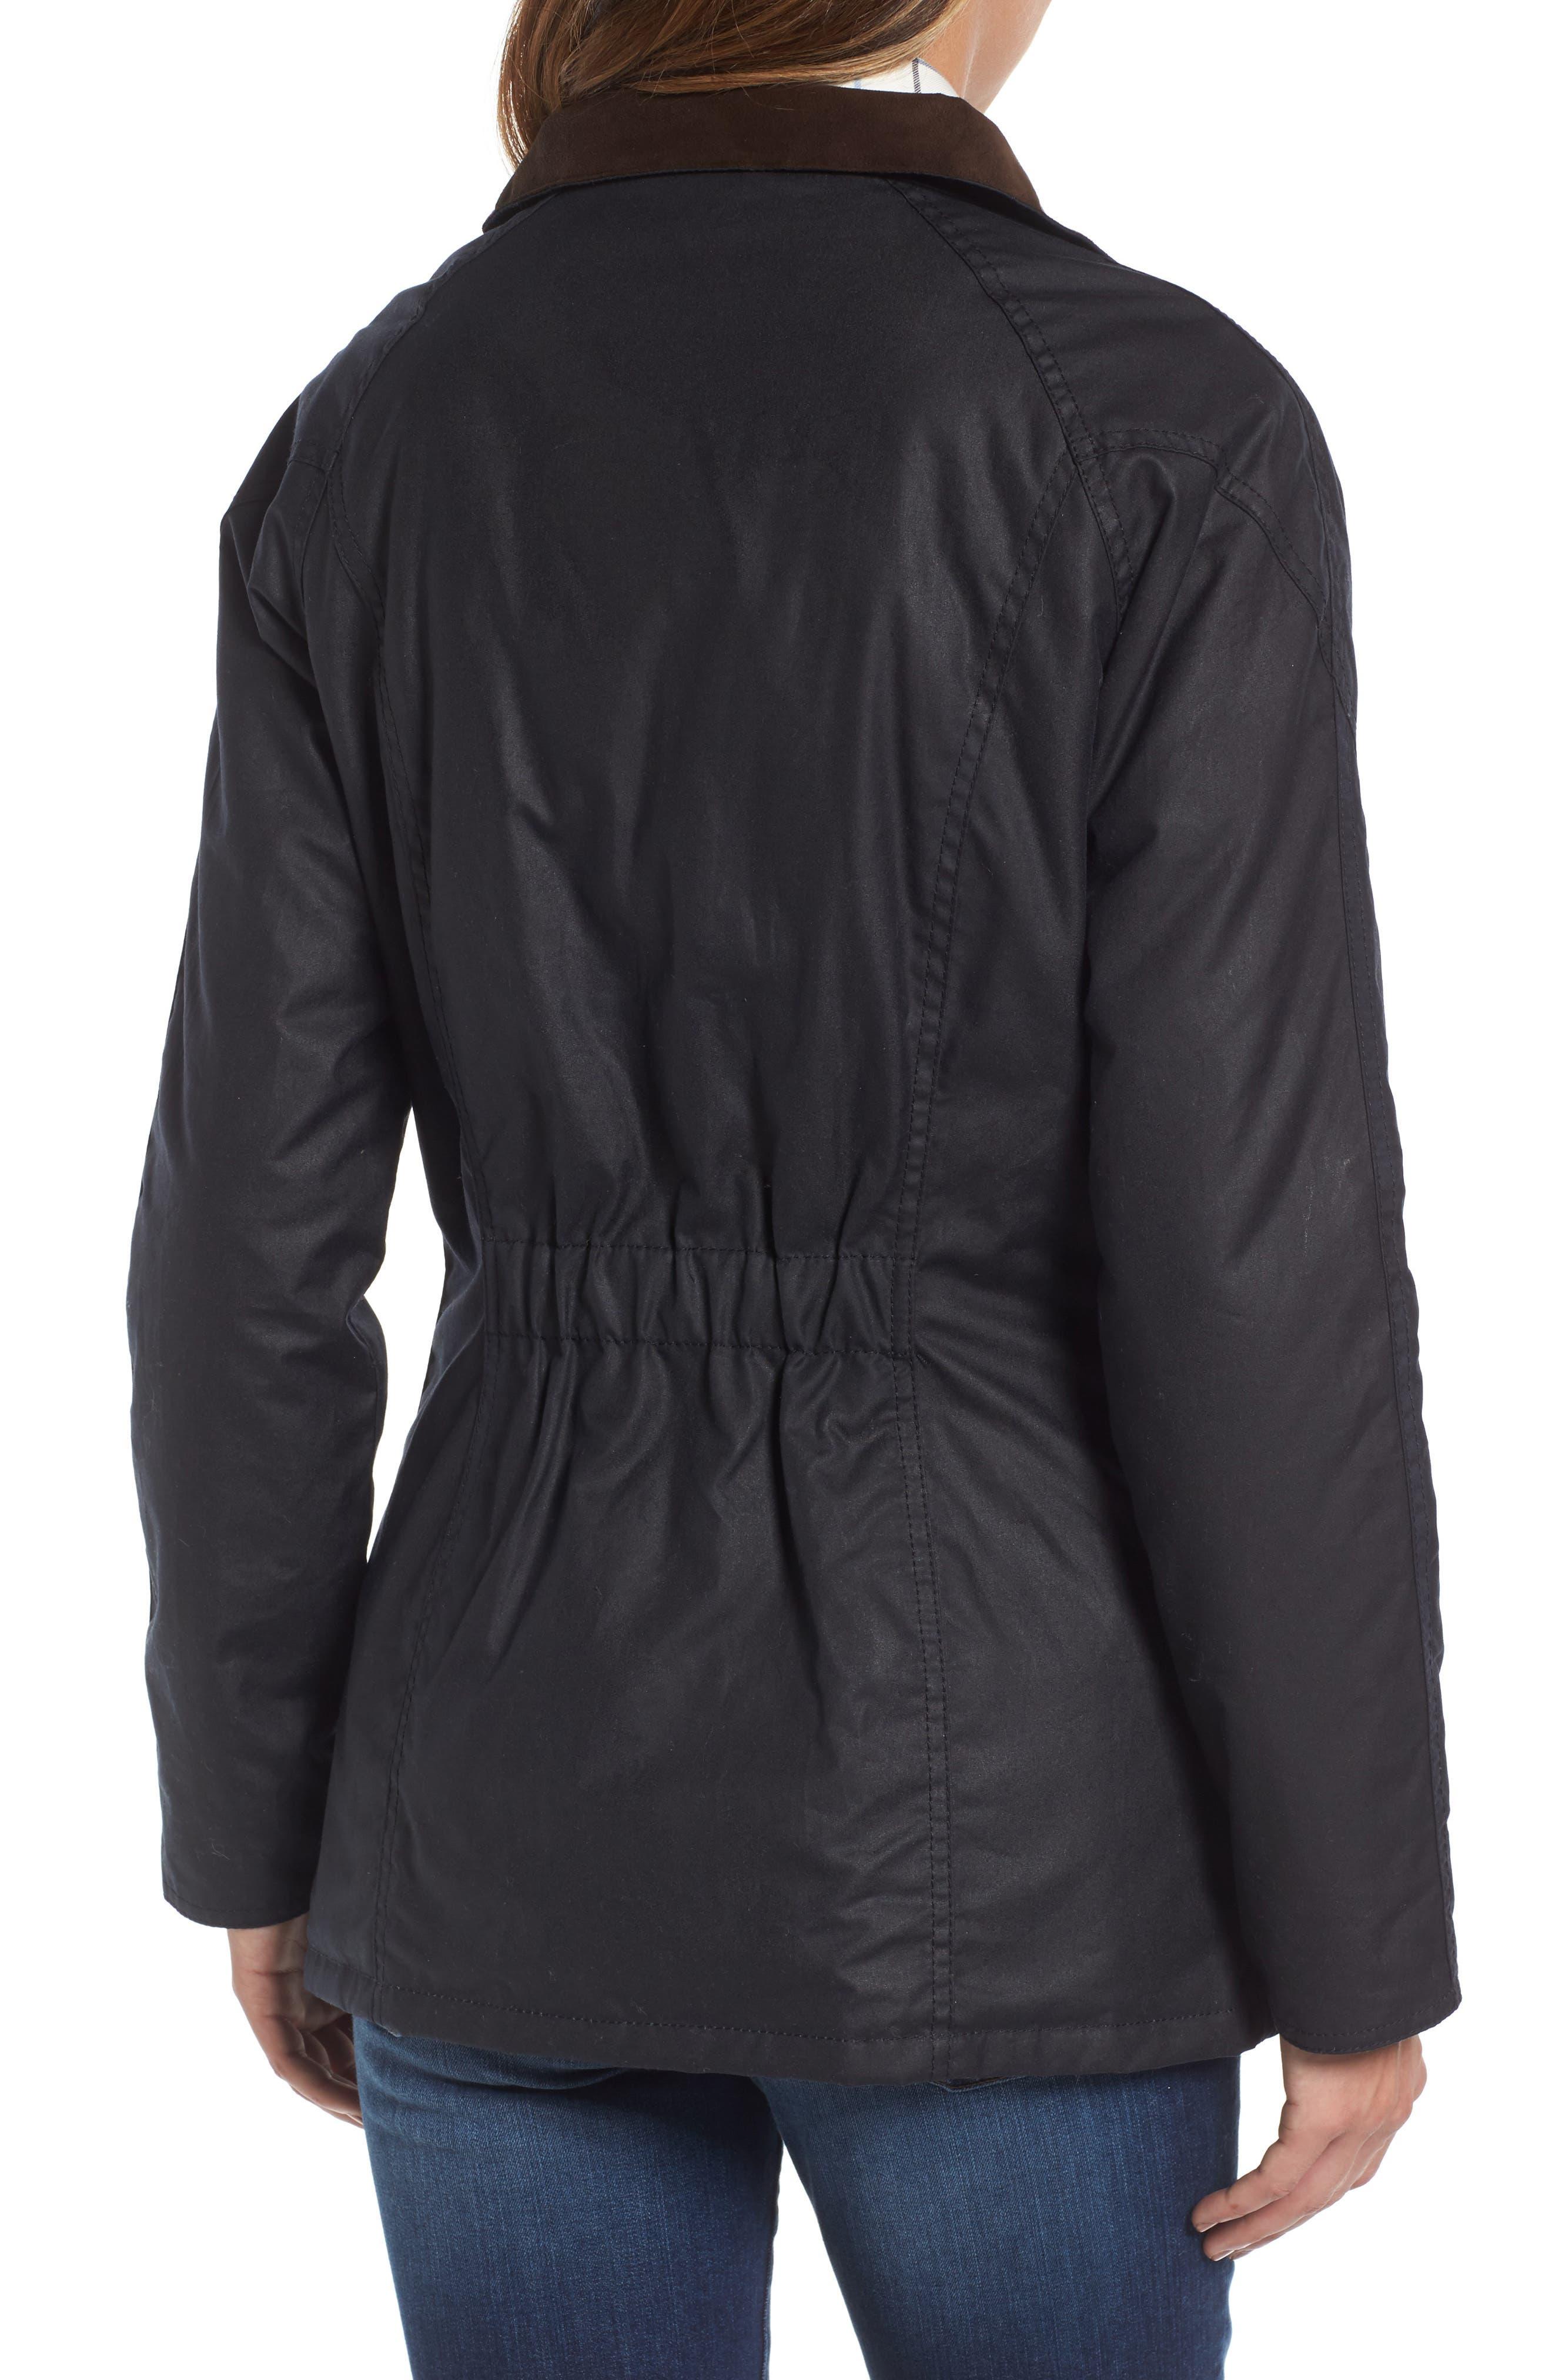 Barrowdale Waxed Cotton Coat,                             Alternate thumbnail 3, color,                             Navy